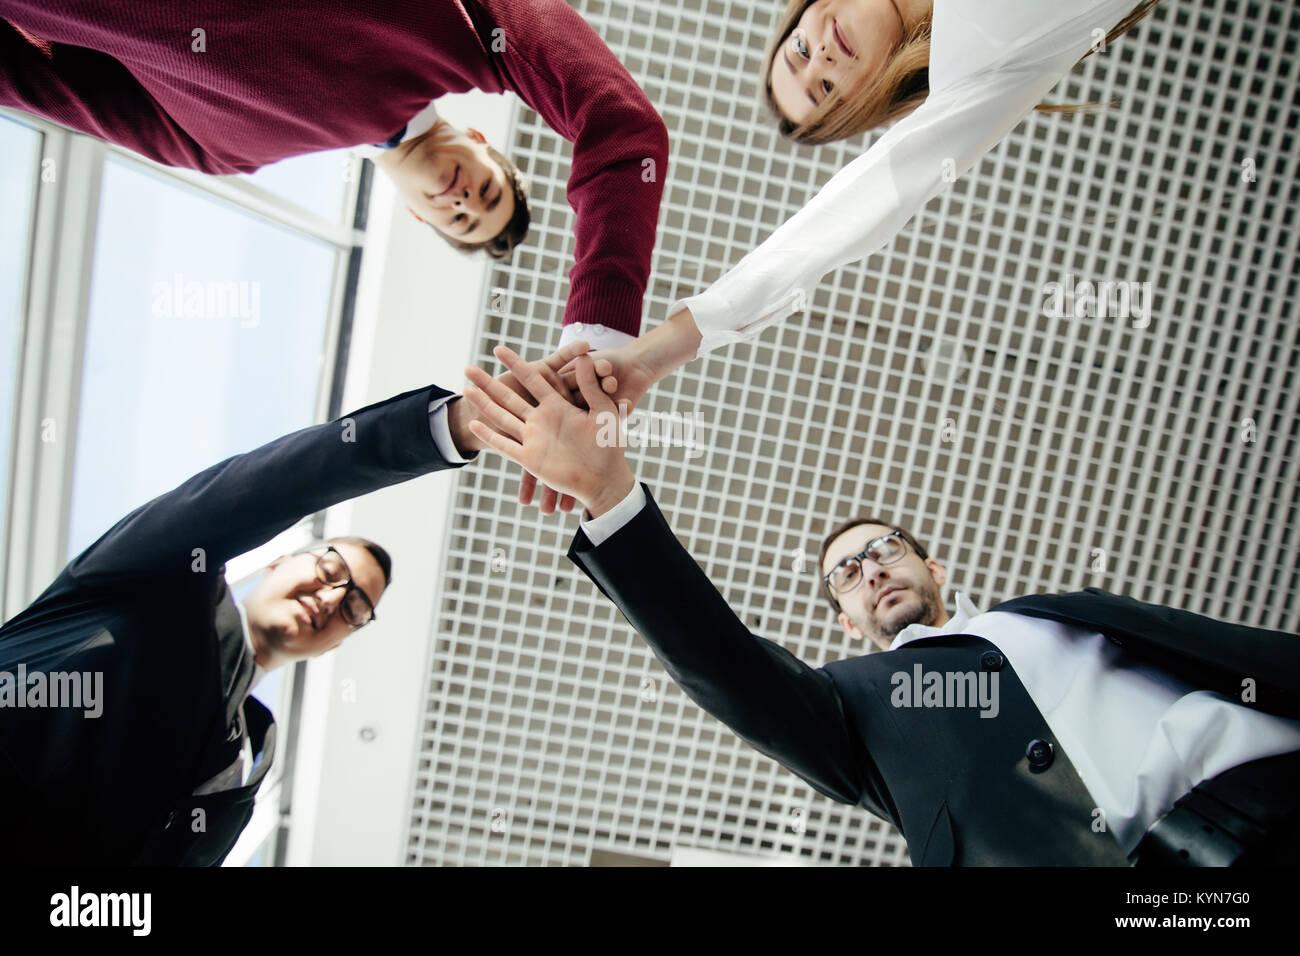 Teamwork Join Hands Support Together Concept. Team work. - Stock Image